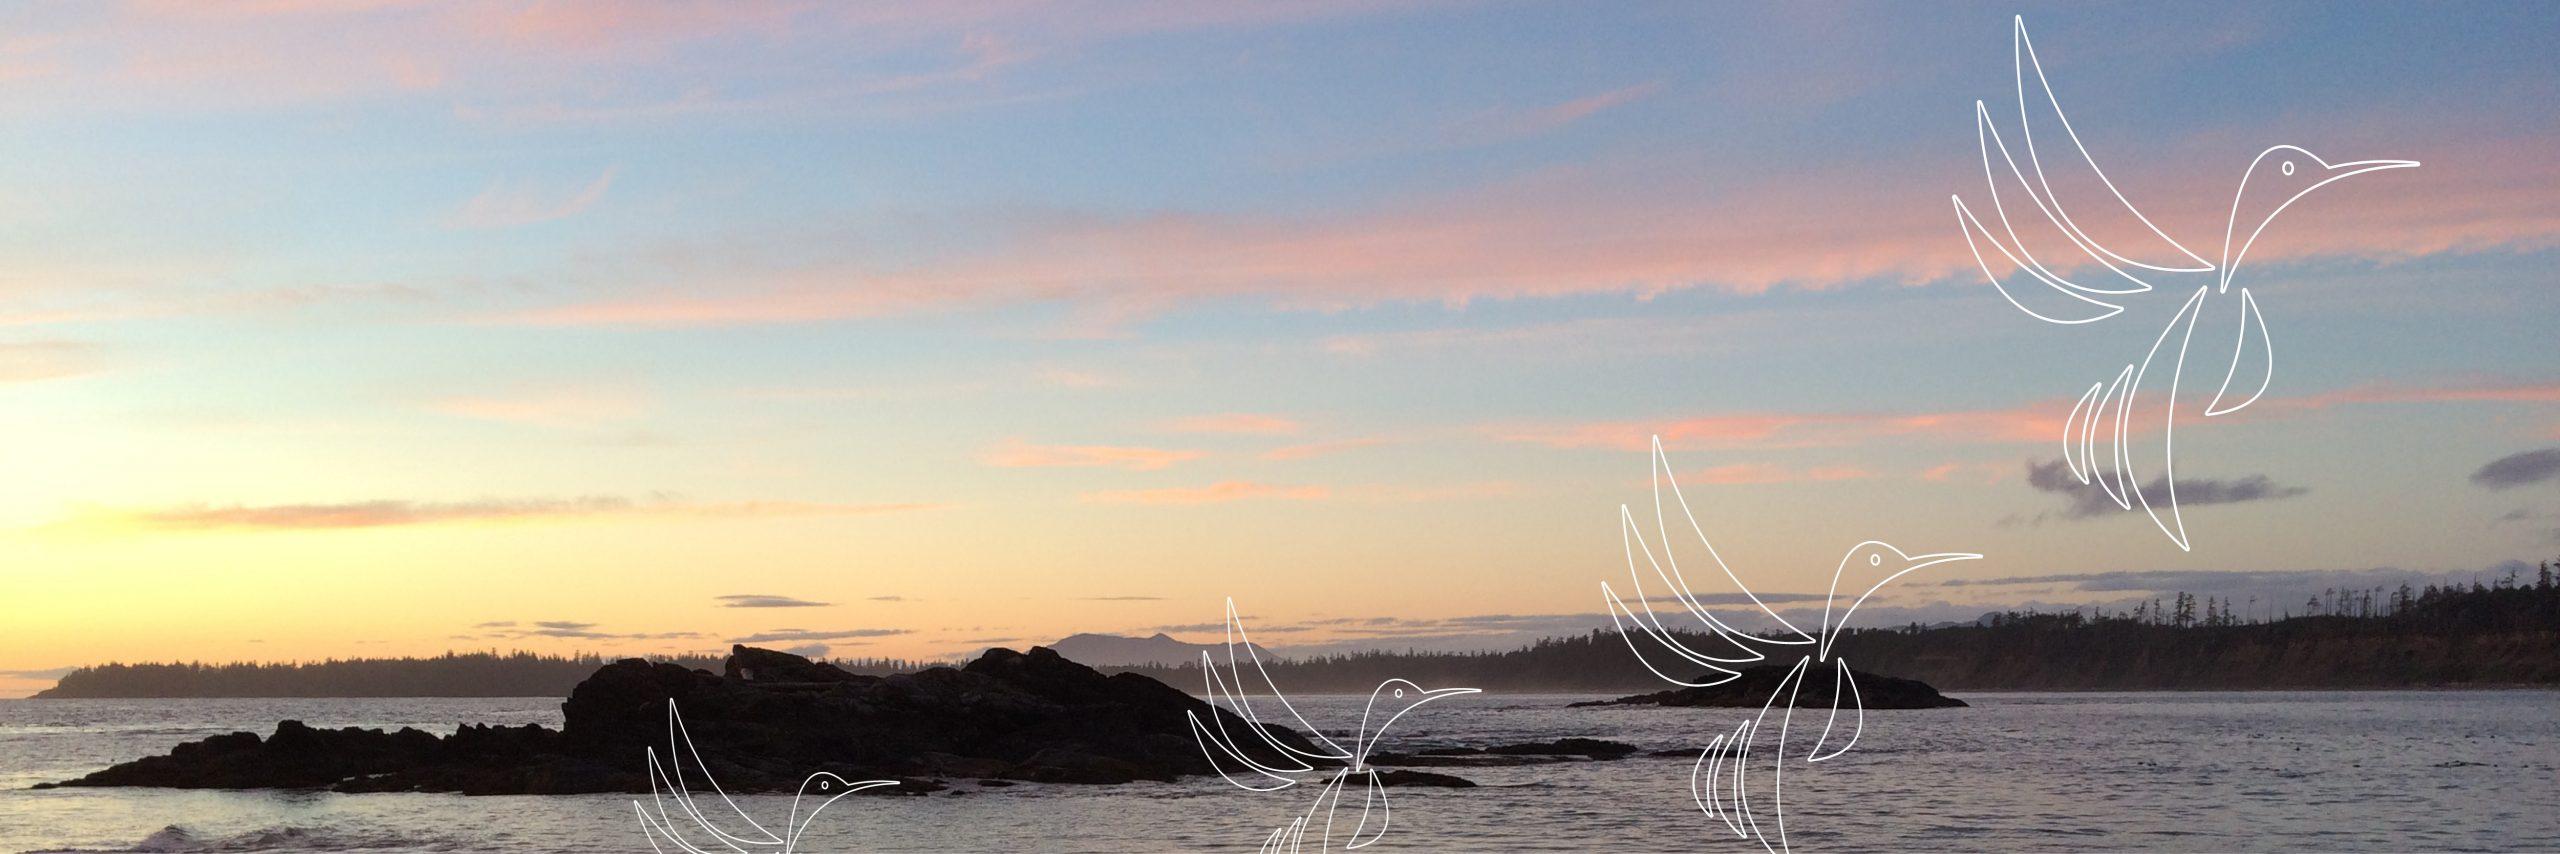 Birds taking flight - inland lakescape